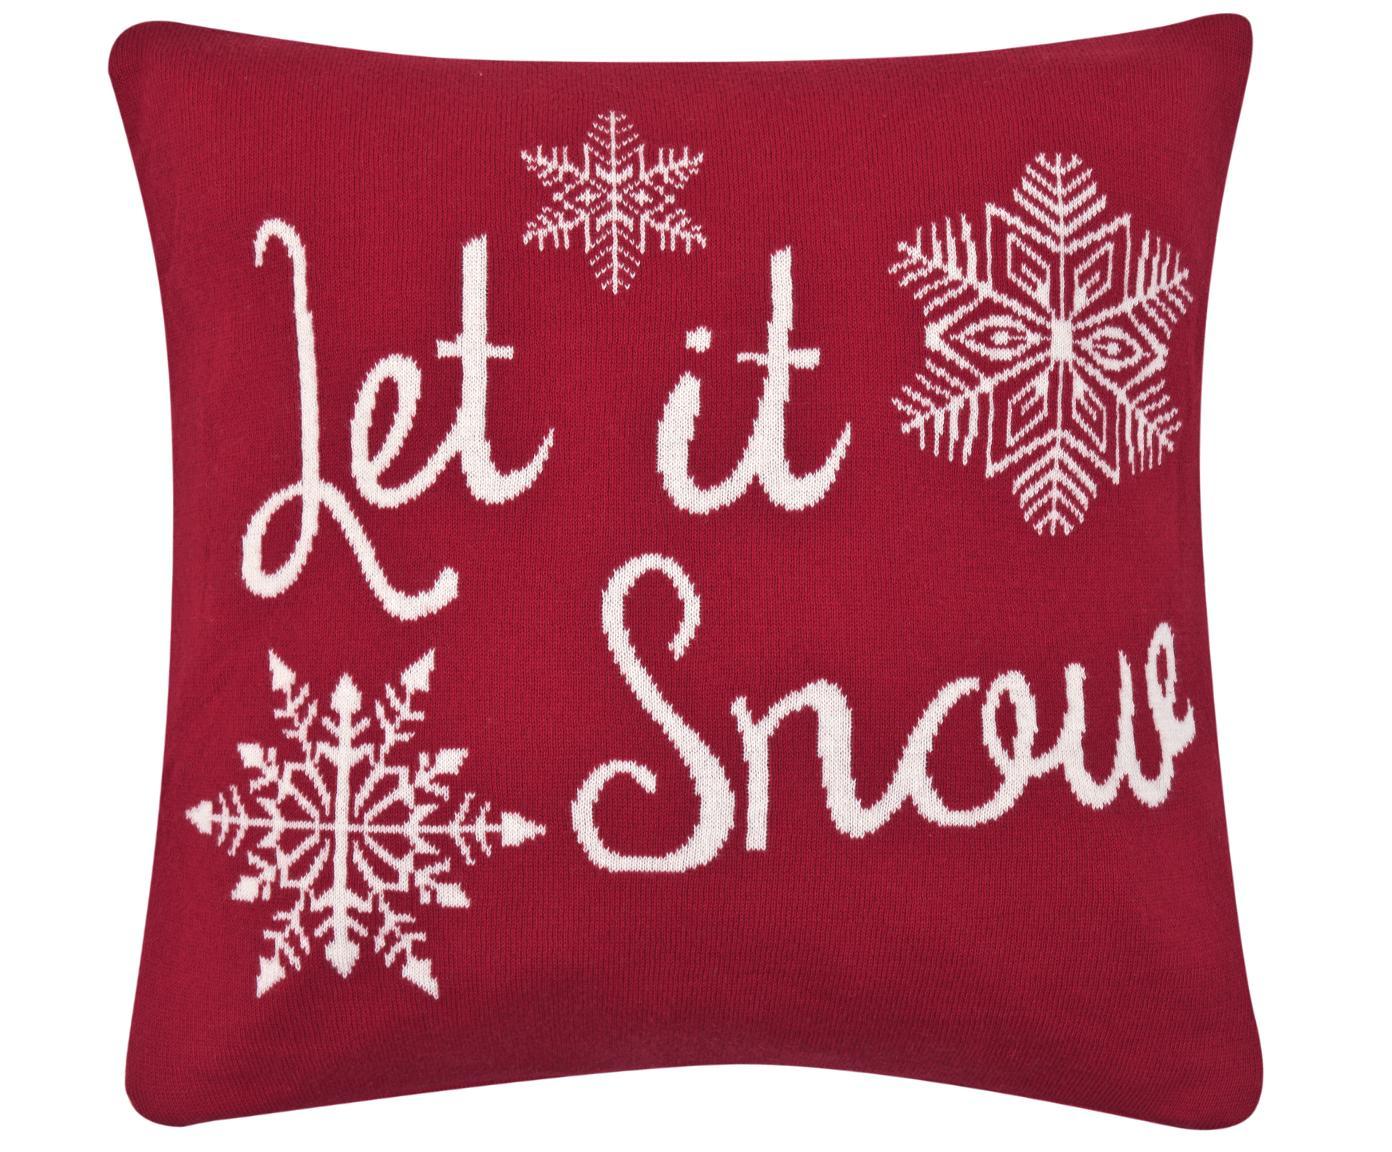 Federa natalizia Let it Snow, Cotone, Rosso, crema, Larg. 40 x Lung. 40 cm